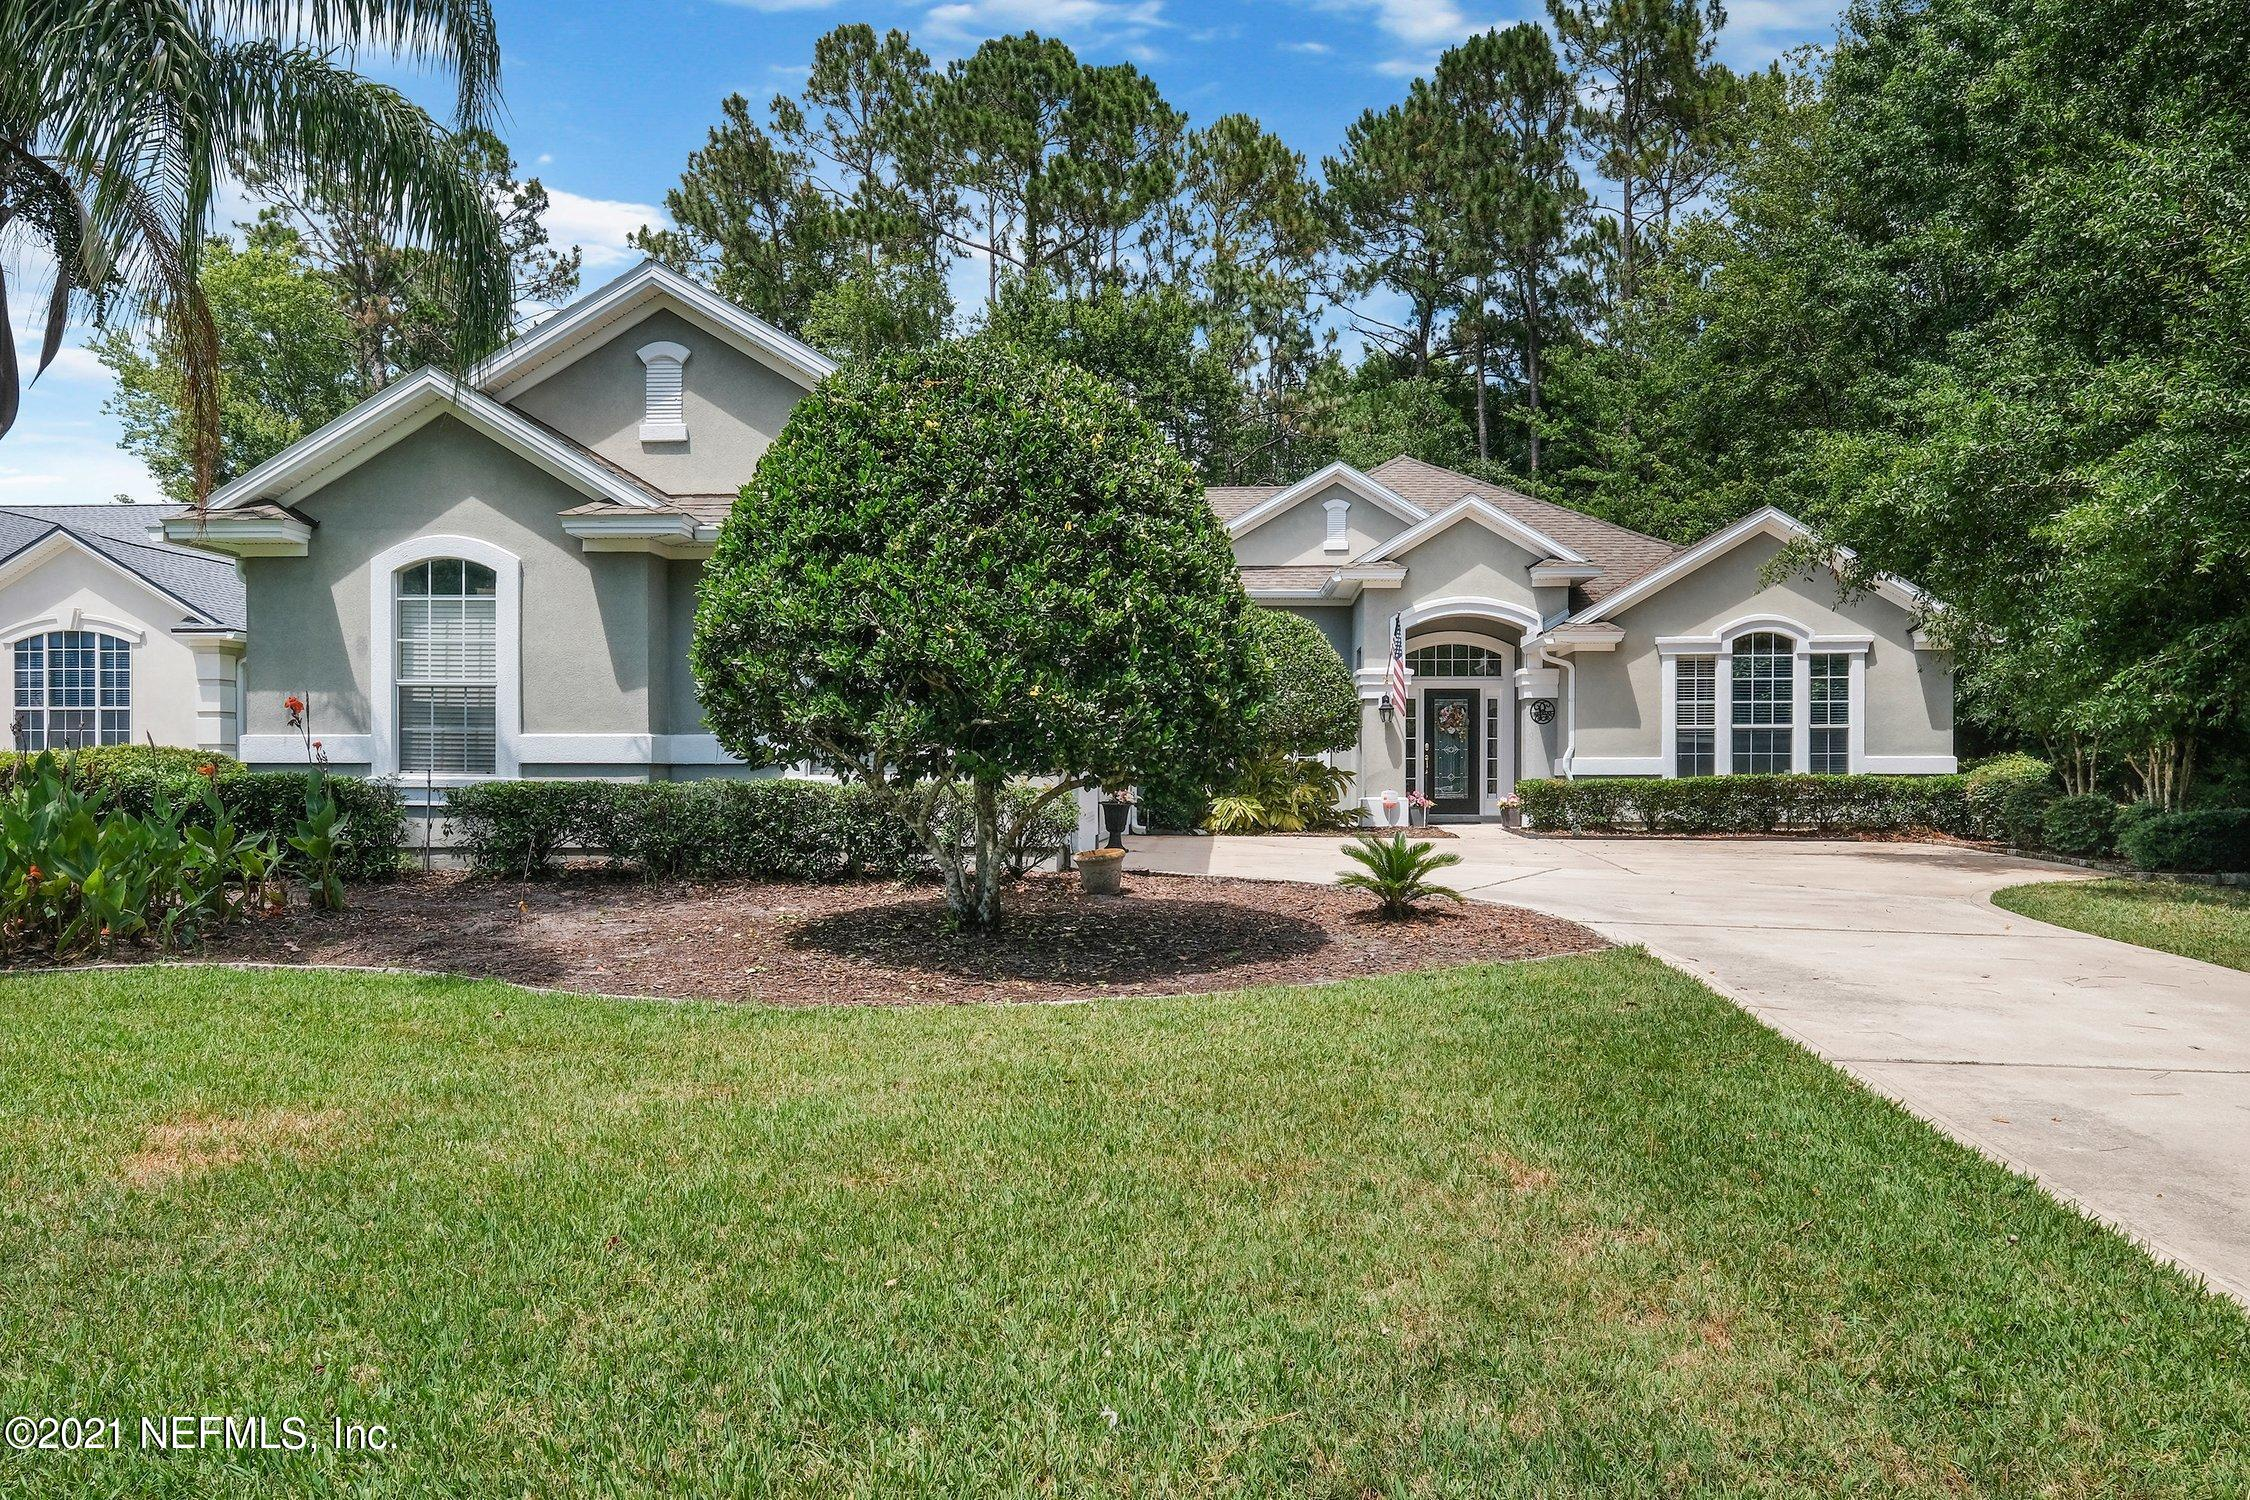 335 LEGACY, ORANGE PARK, FLORIDA 32073, 5 Bedrooms Bedrooms, ,3 BathroomsBathrooms,Residential,For sale,LEGACY,1123433